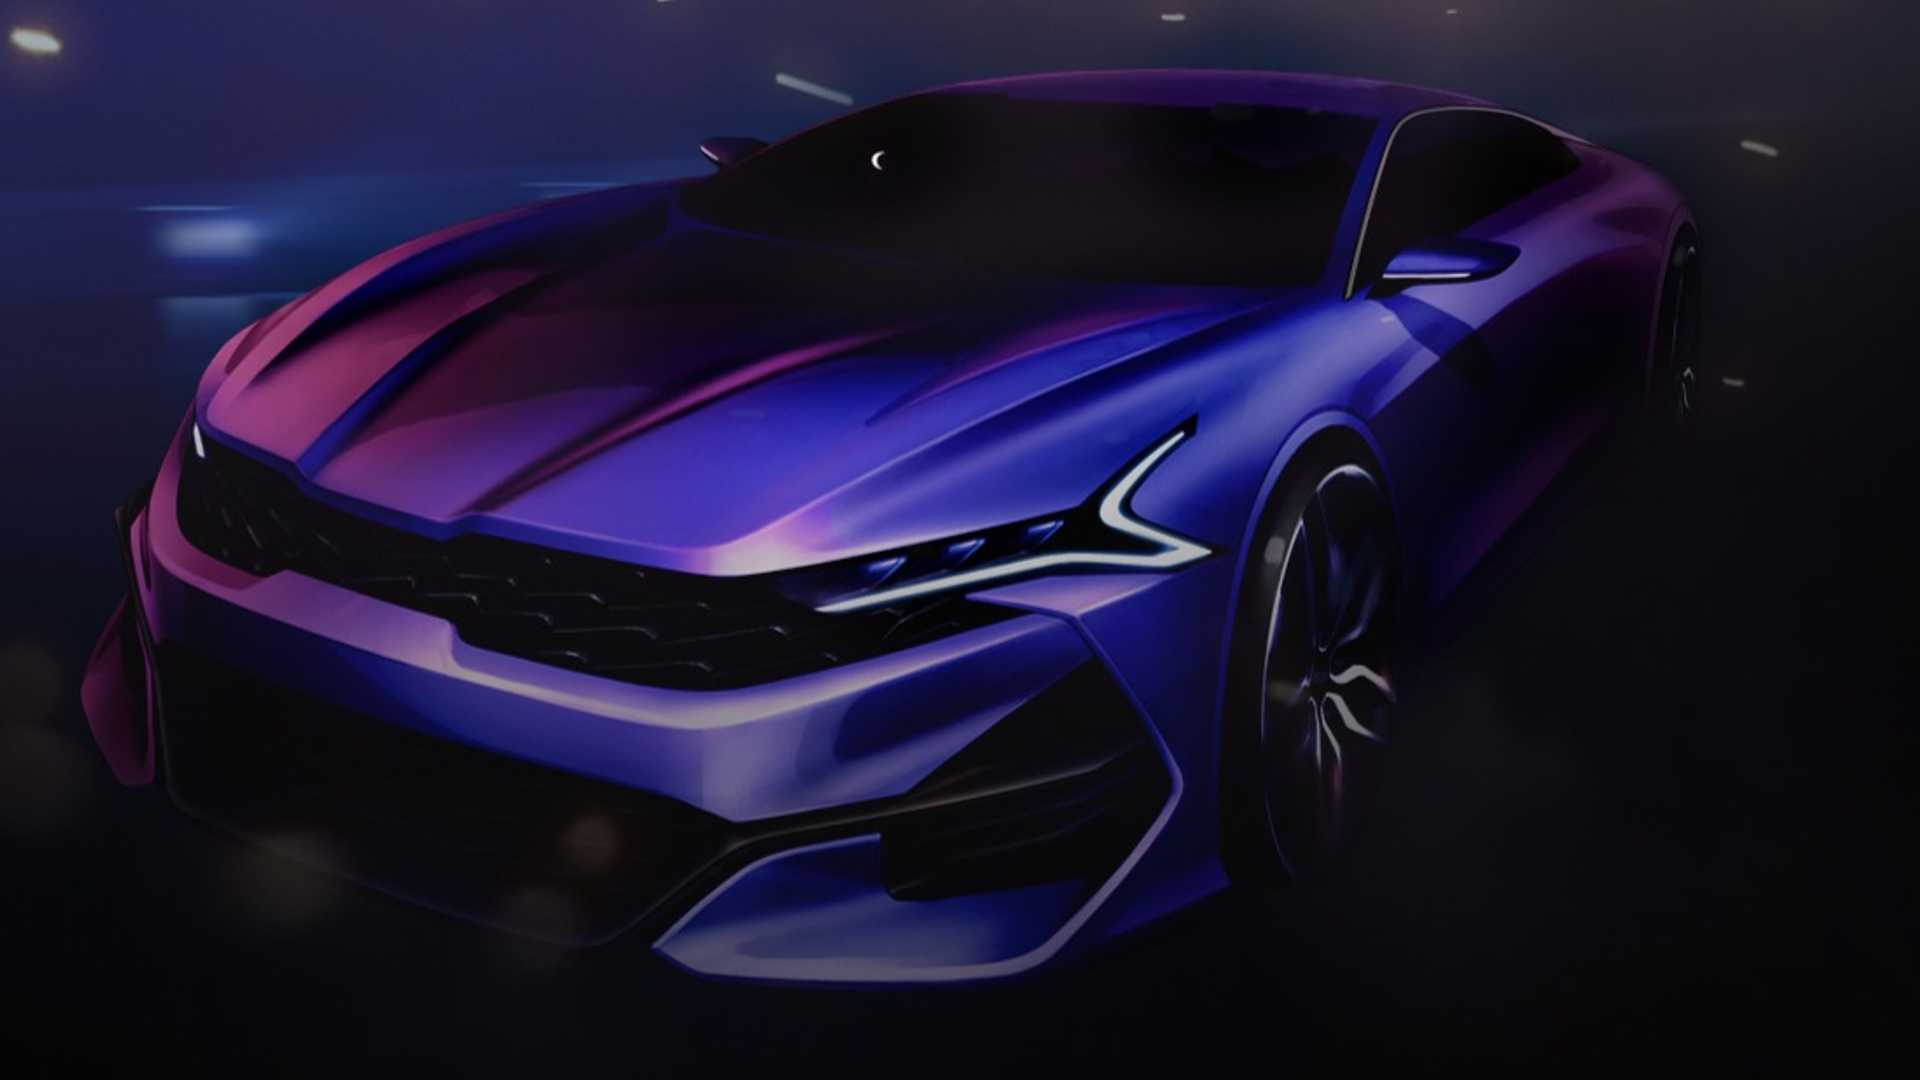 2021 Kia Optima Returns In Dramatic Design Sketches